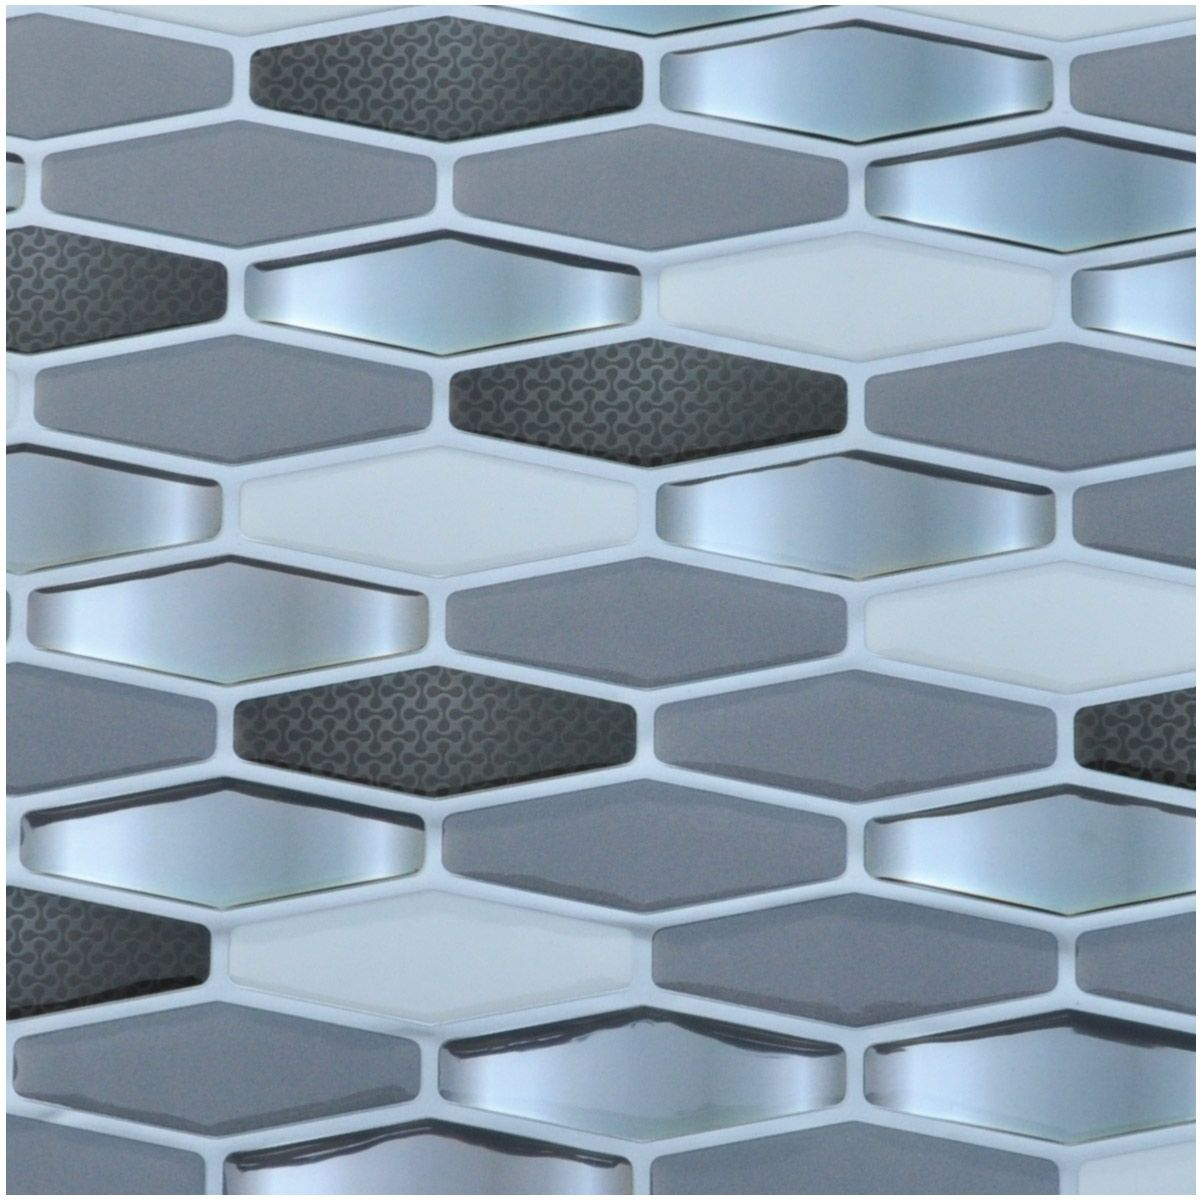 Diamond Wall Tile Peel And Stick Backsplash For Kitchen 5 8 Sq Ft